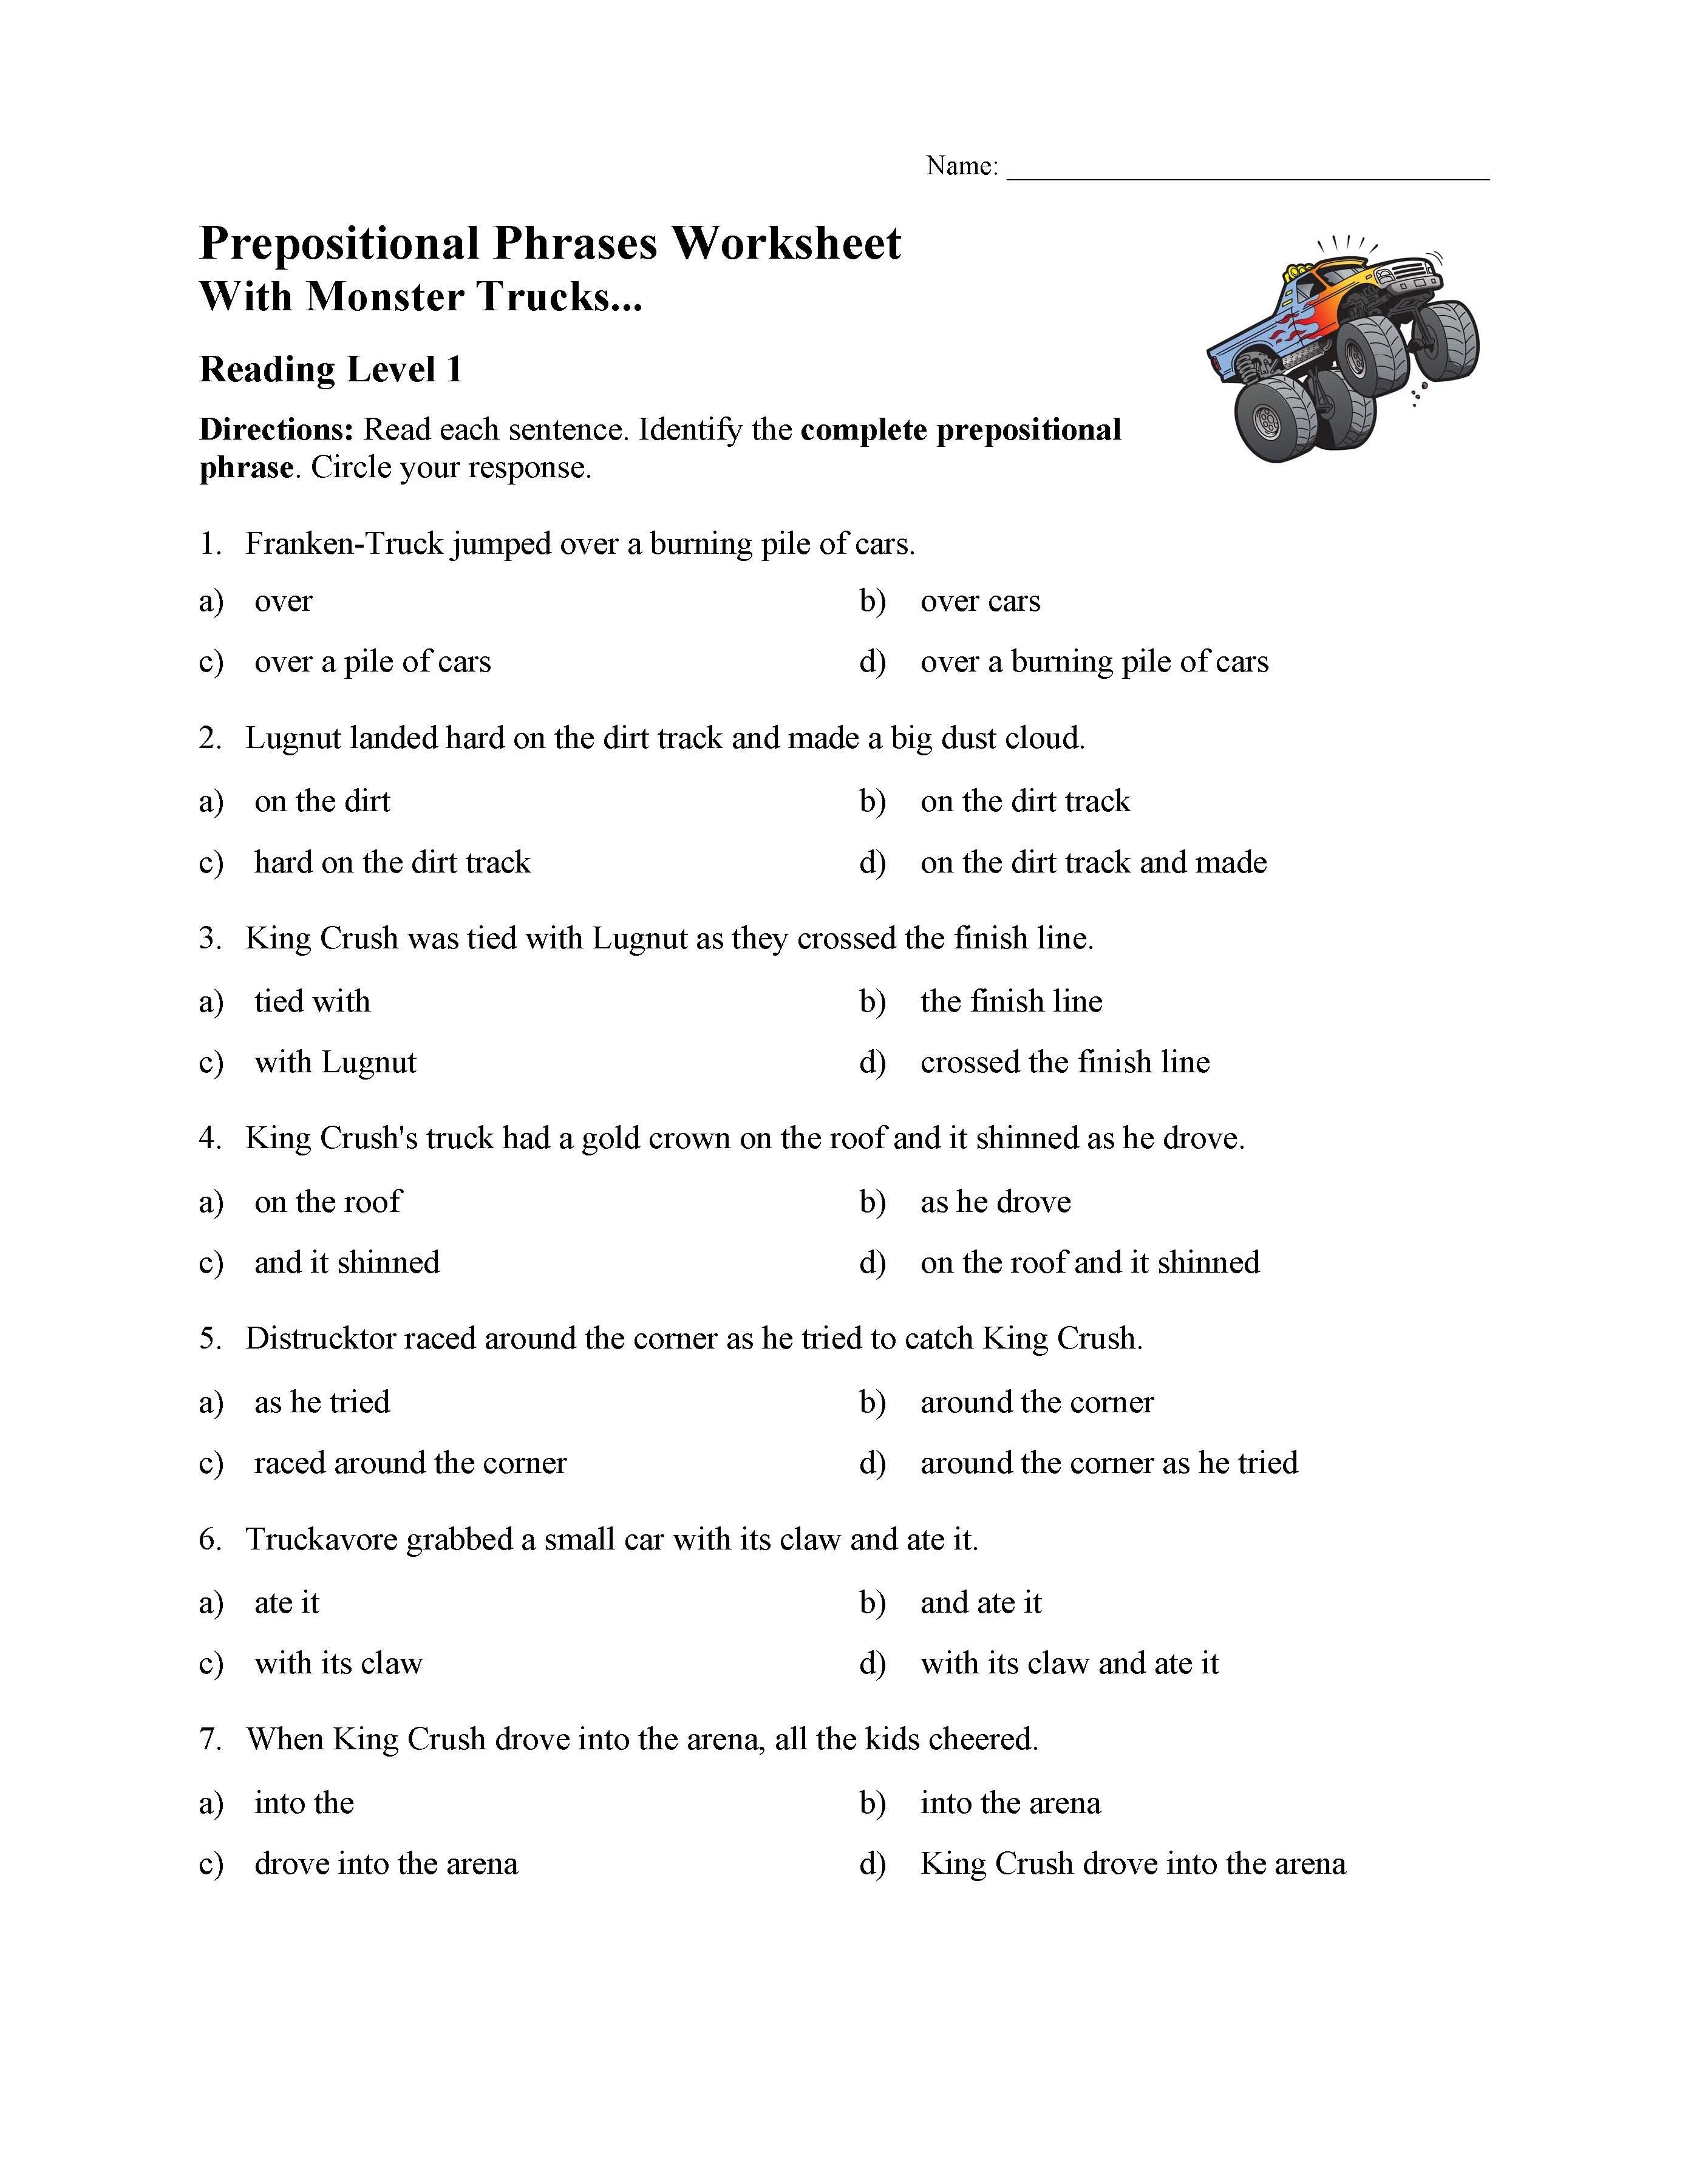 - Prepositional Phrases Worksheet 1 - Reading Level 1 Preview